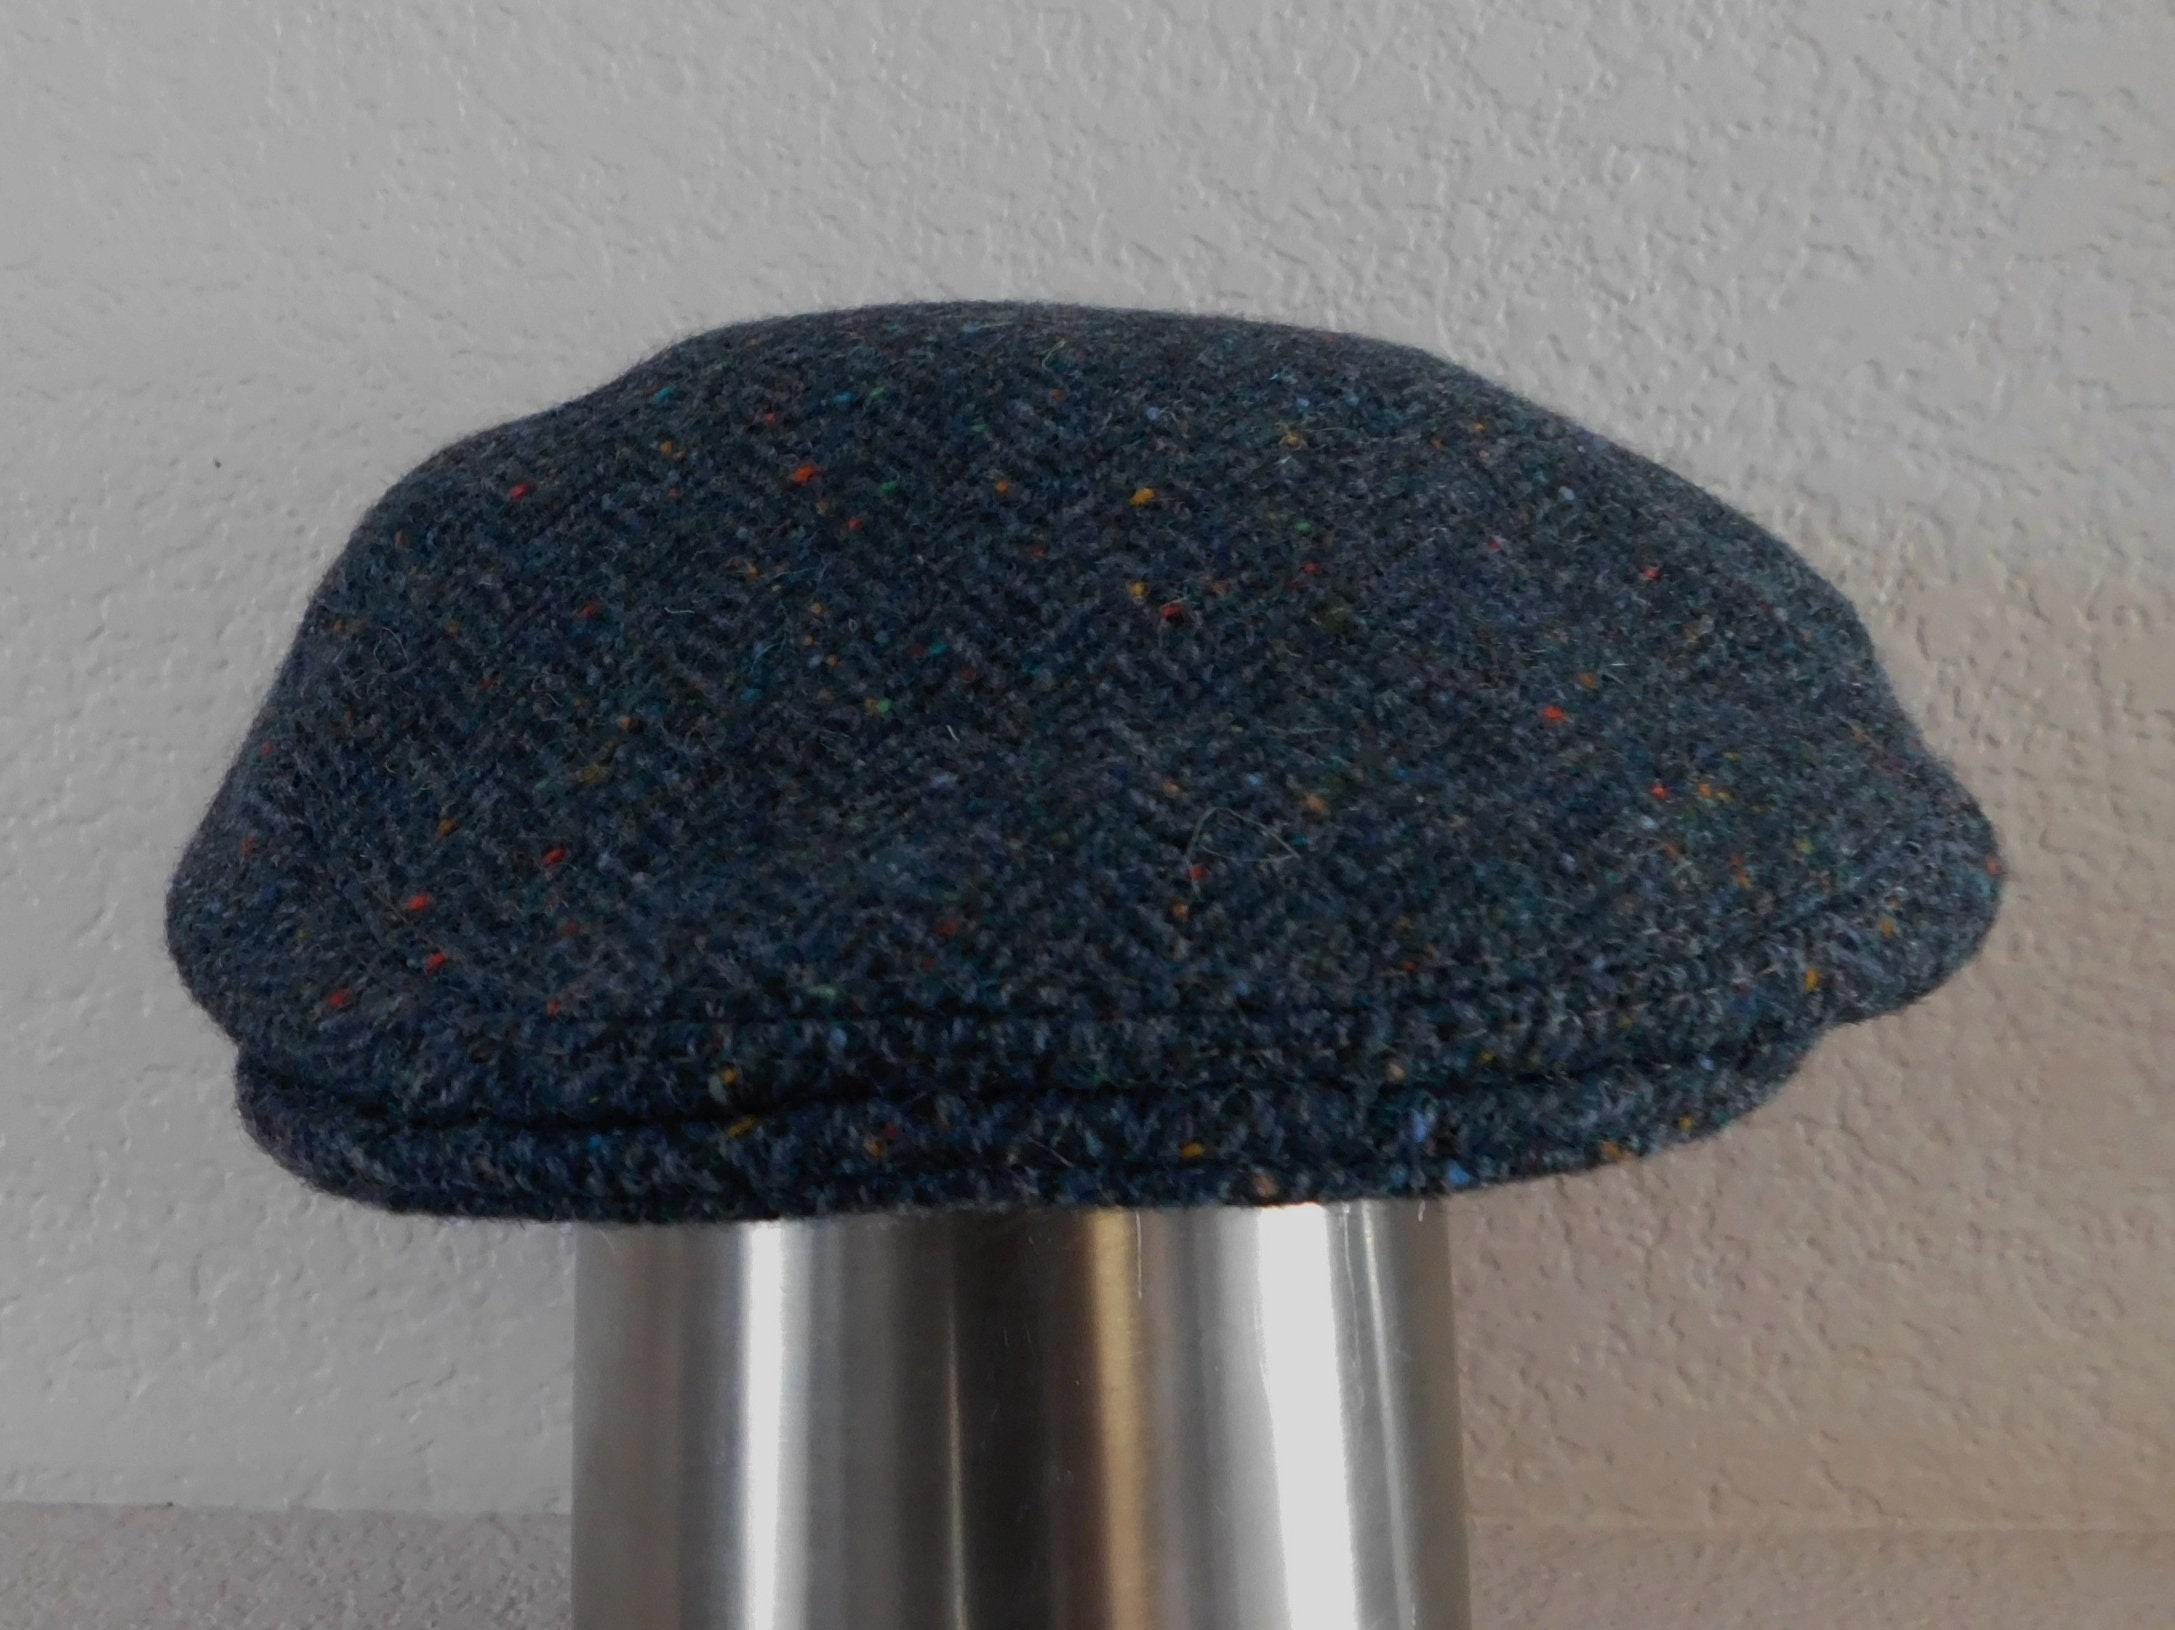 Shandon head wear Donegal tweed woven in Ireland new wool size  9f54cb4c4c5